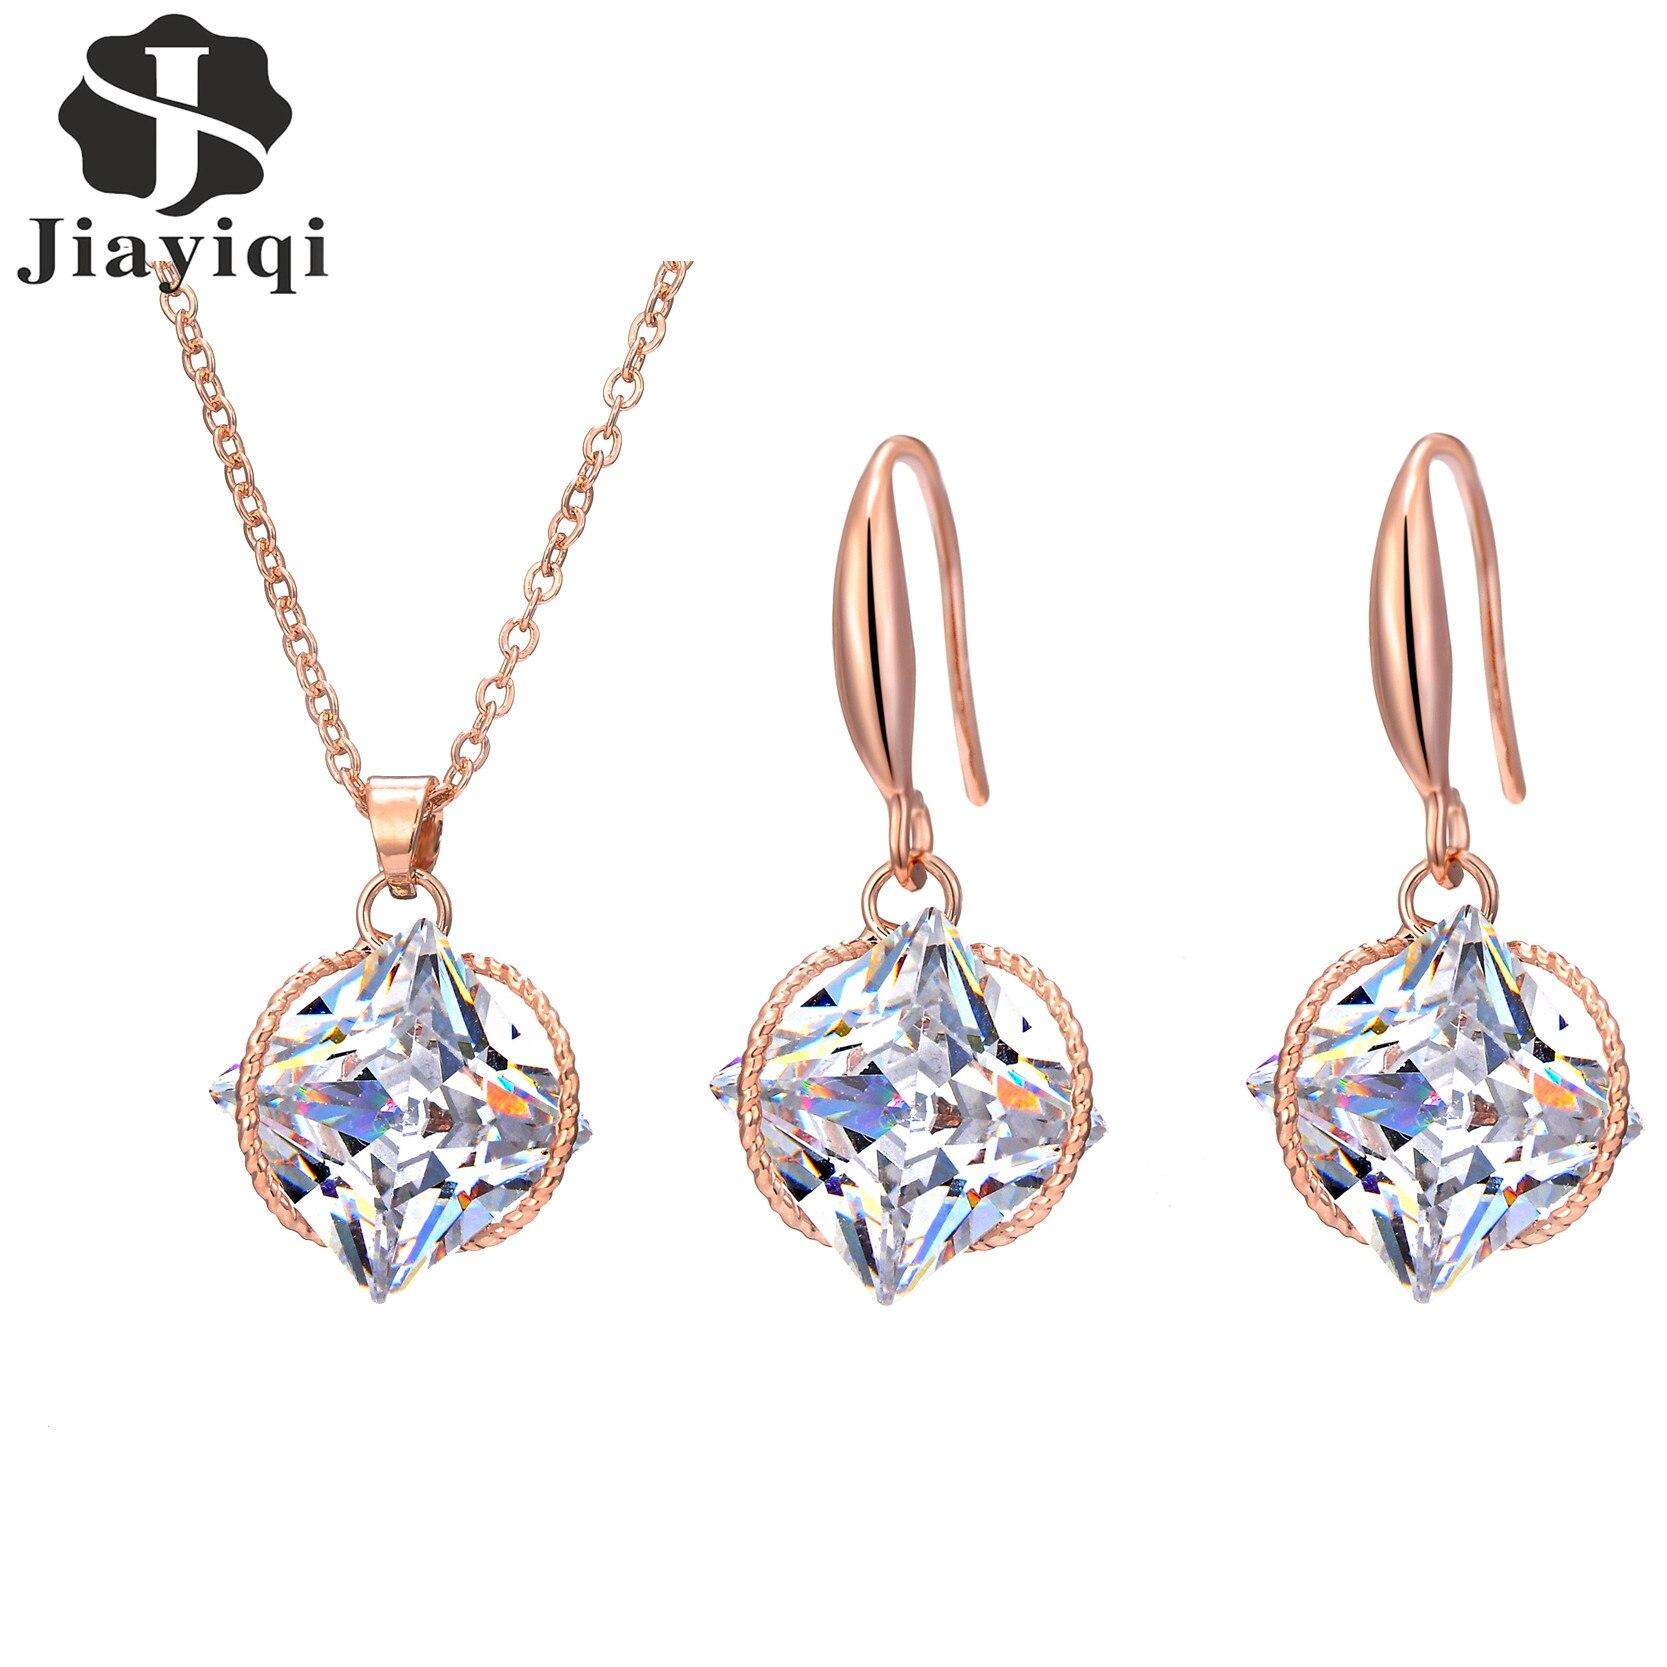 New Geometric Zircon Set Perhiasan Perak dan Emas Warna Kalung Dan Menjuntai Drop Earrings untuk Wanita Perhiasan Halus JX3035